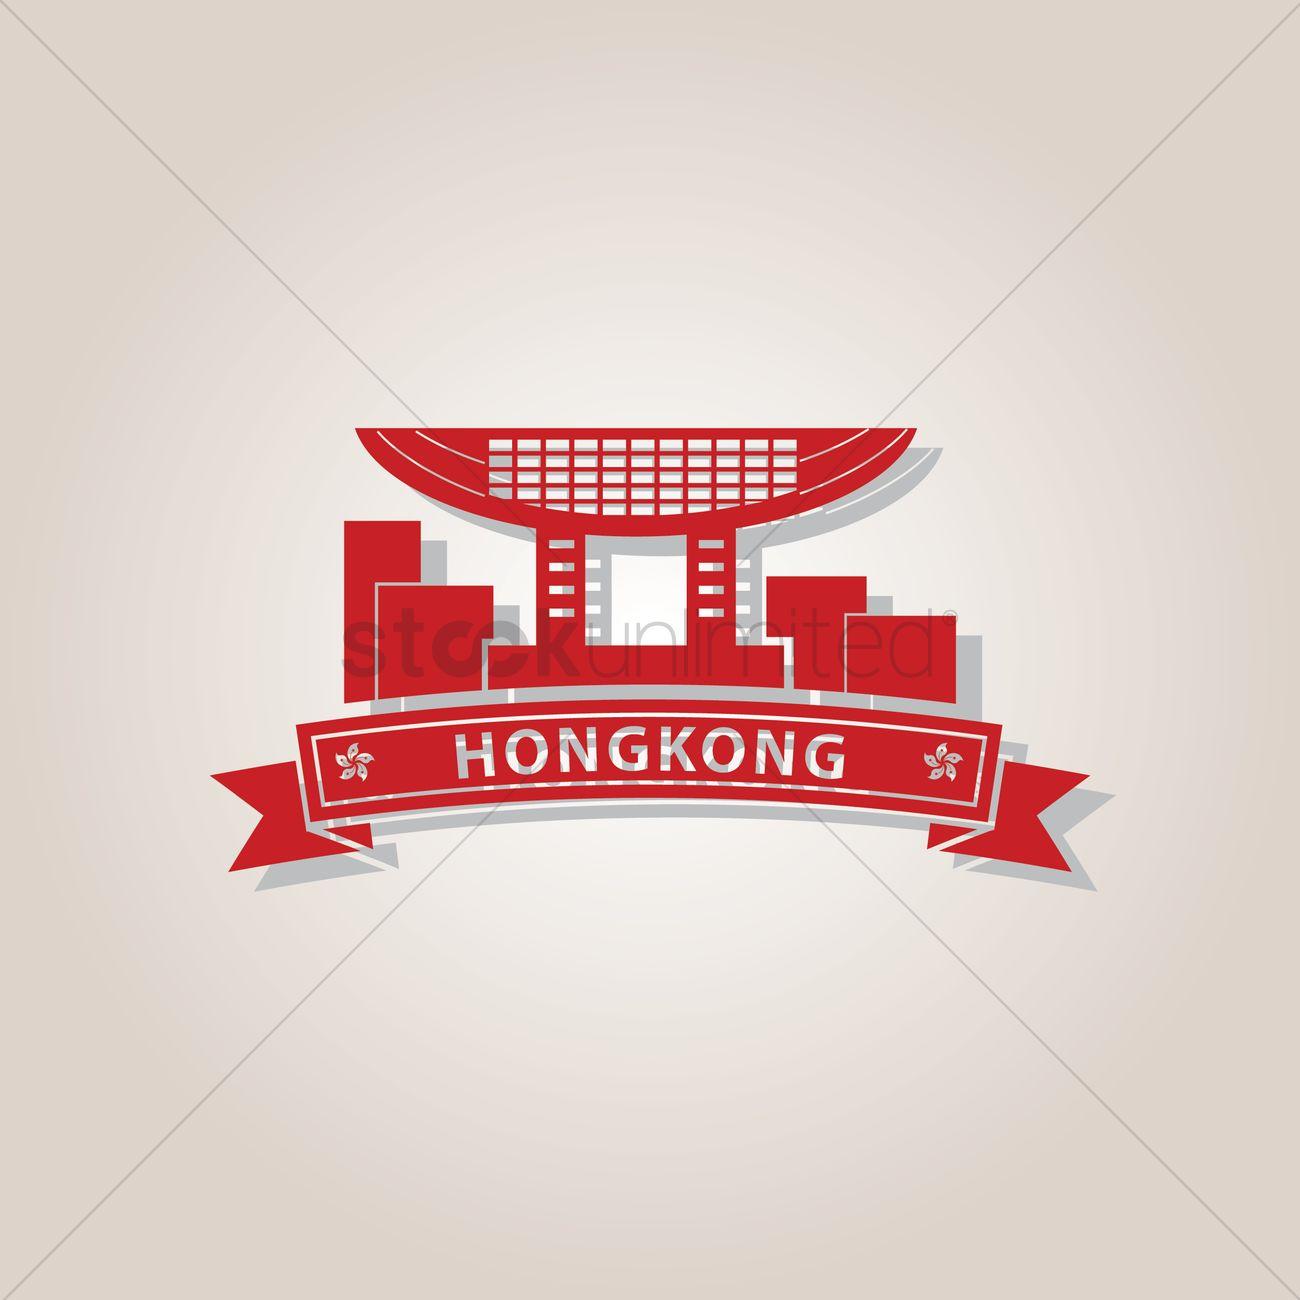 Building Buildings Architecture Architectures Hong Kong Hongkong.